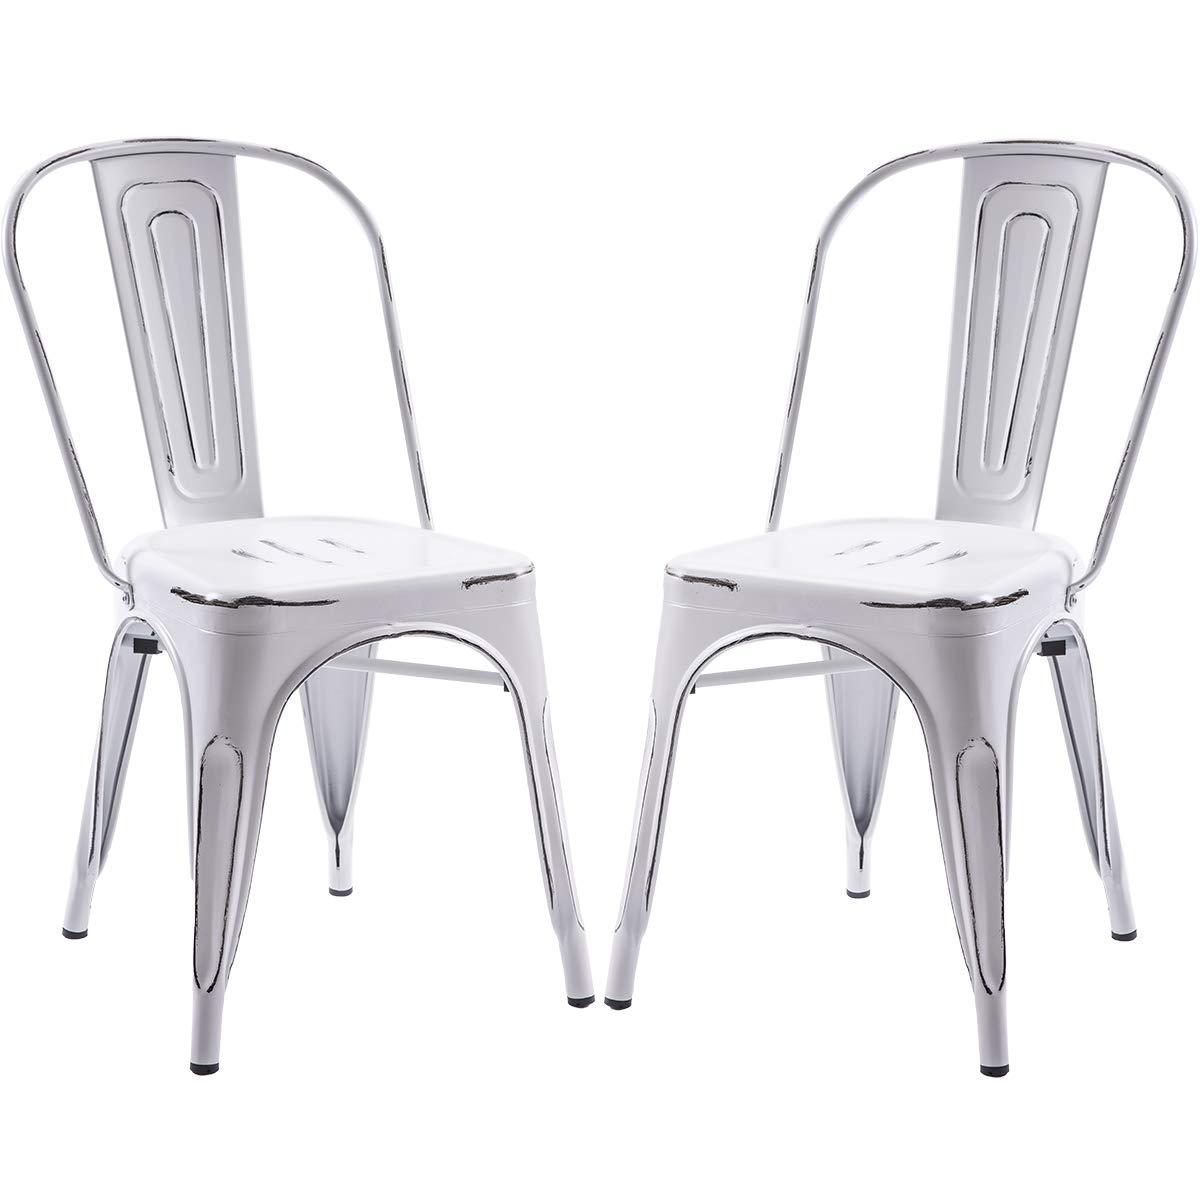 Merax Metal Dining Chair, Antique White